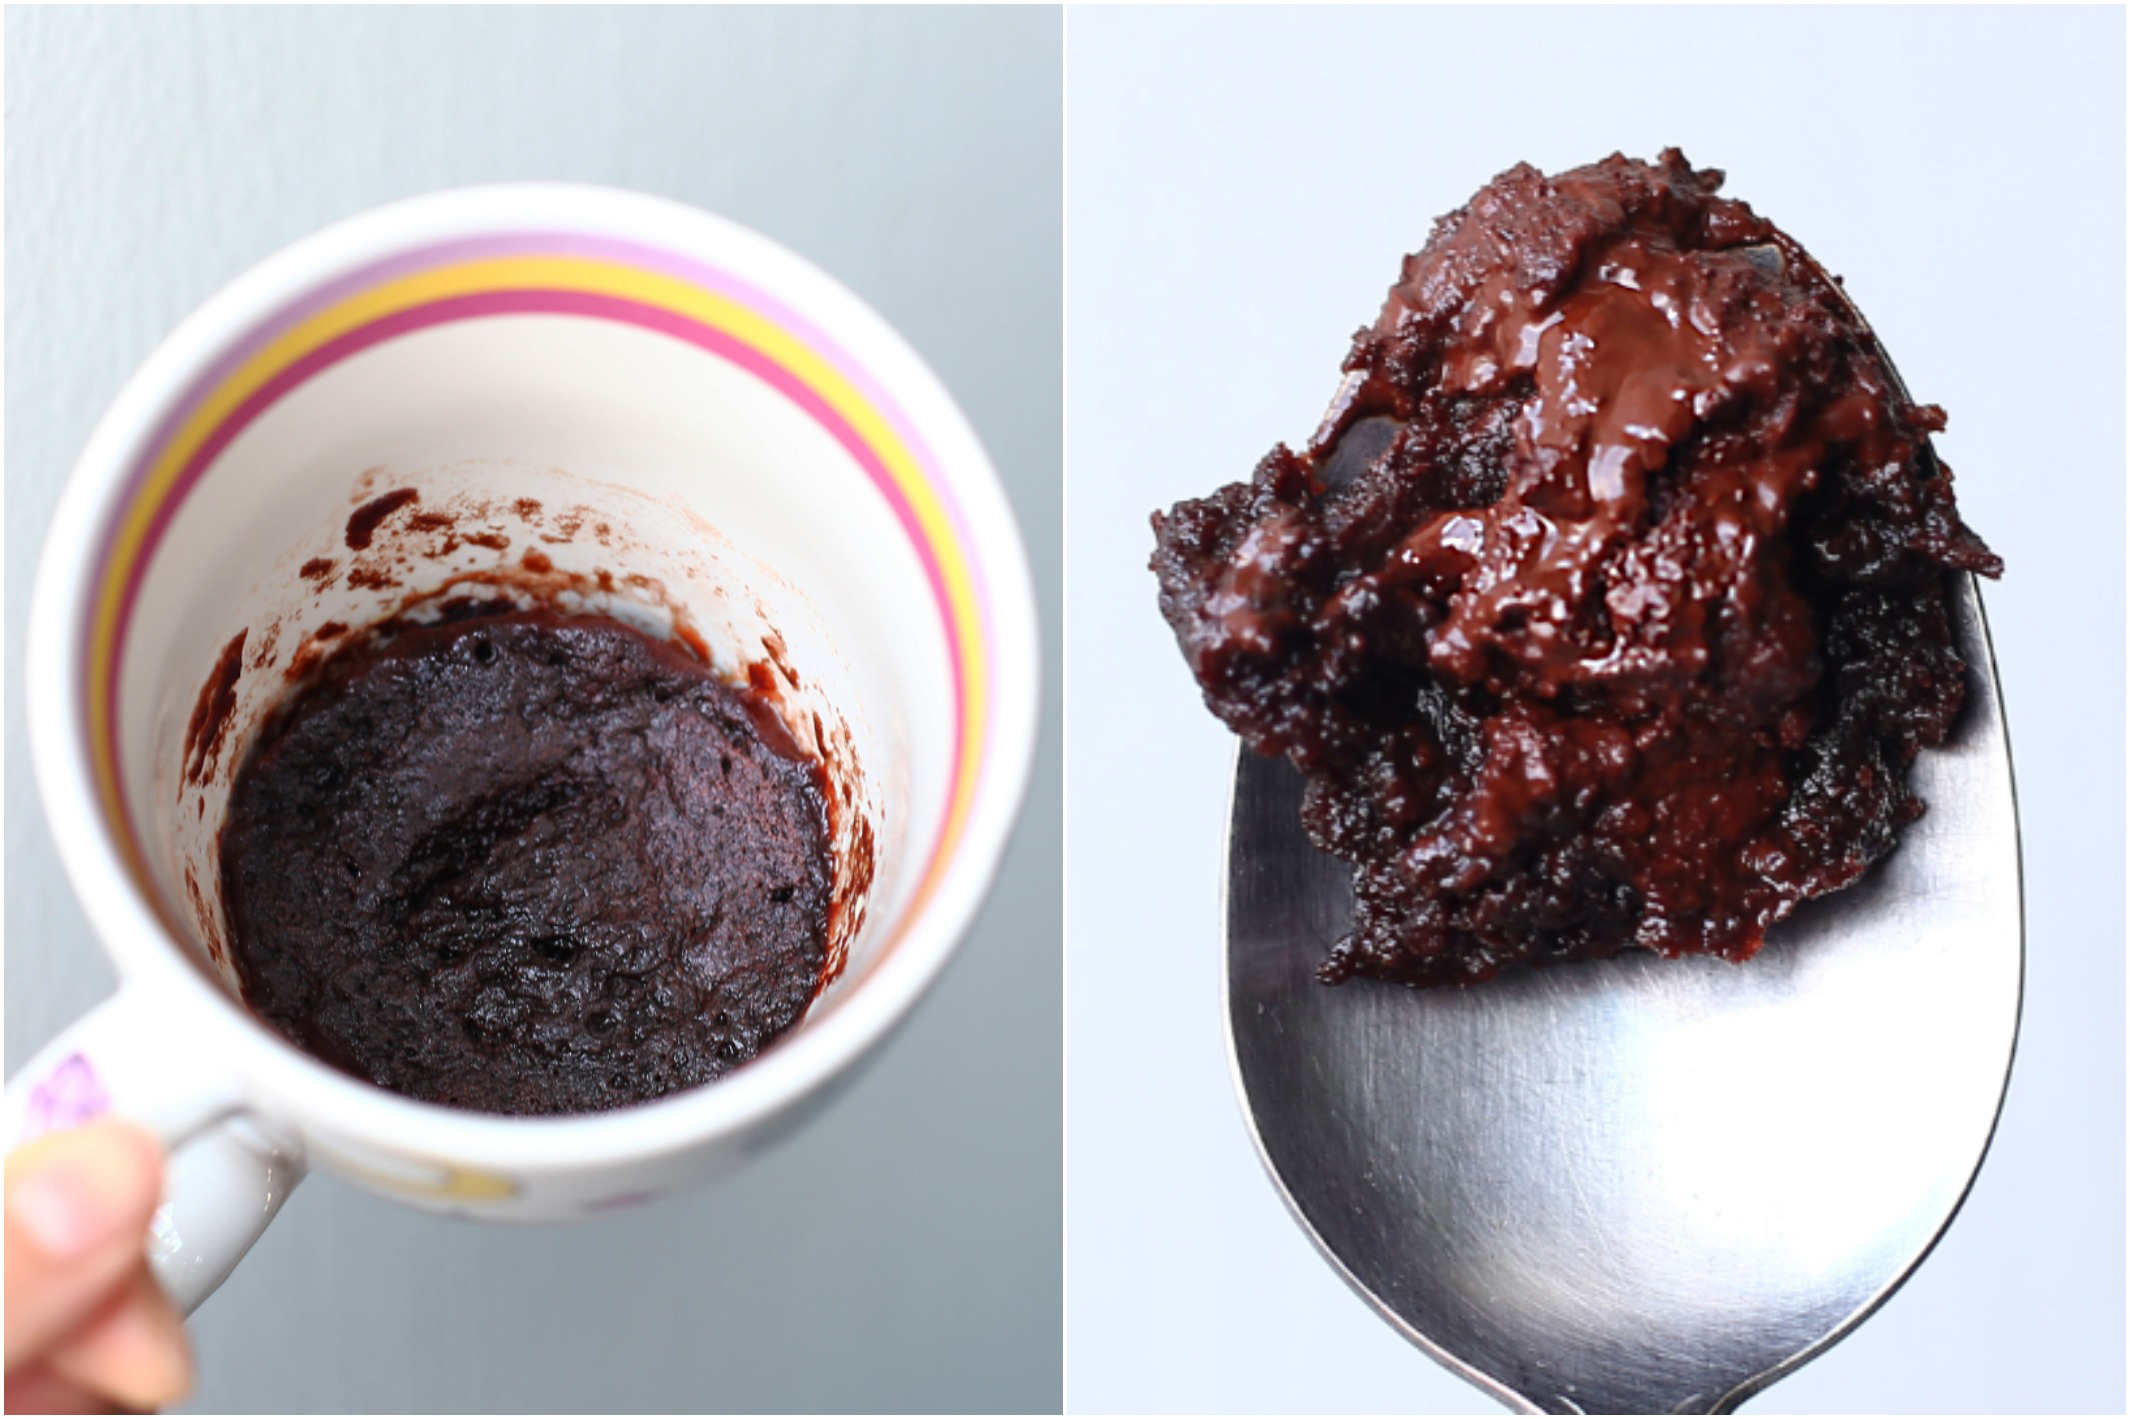 Microwave Chocolate Lava Cake Collage